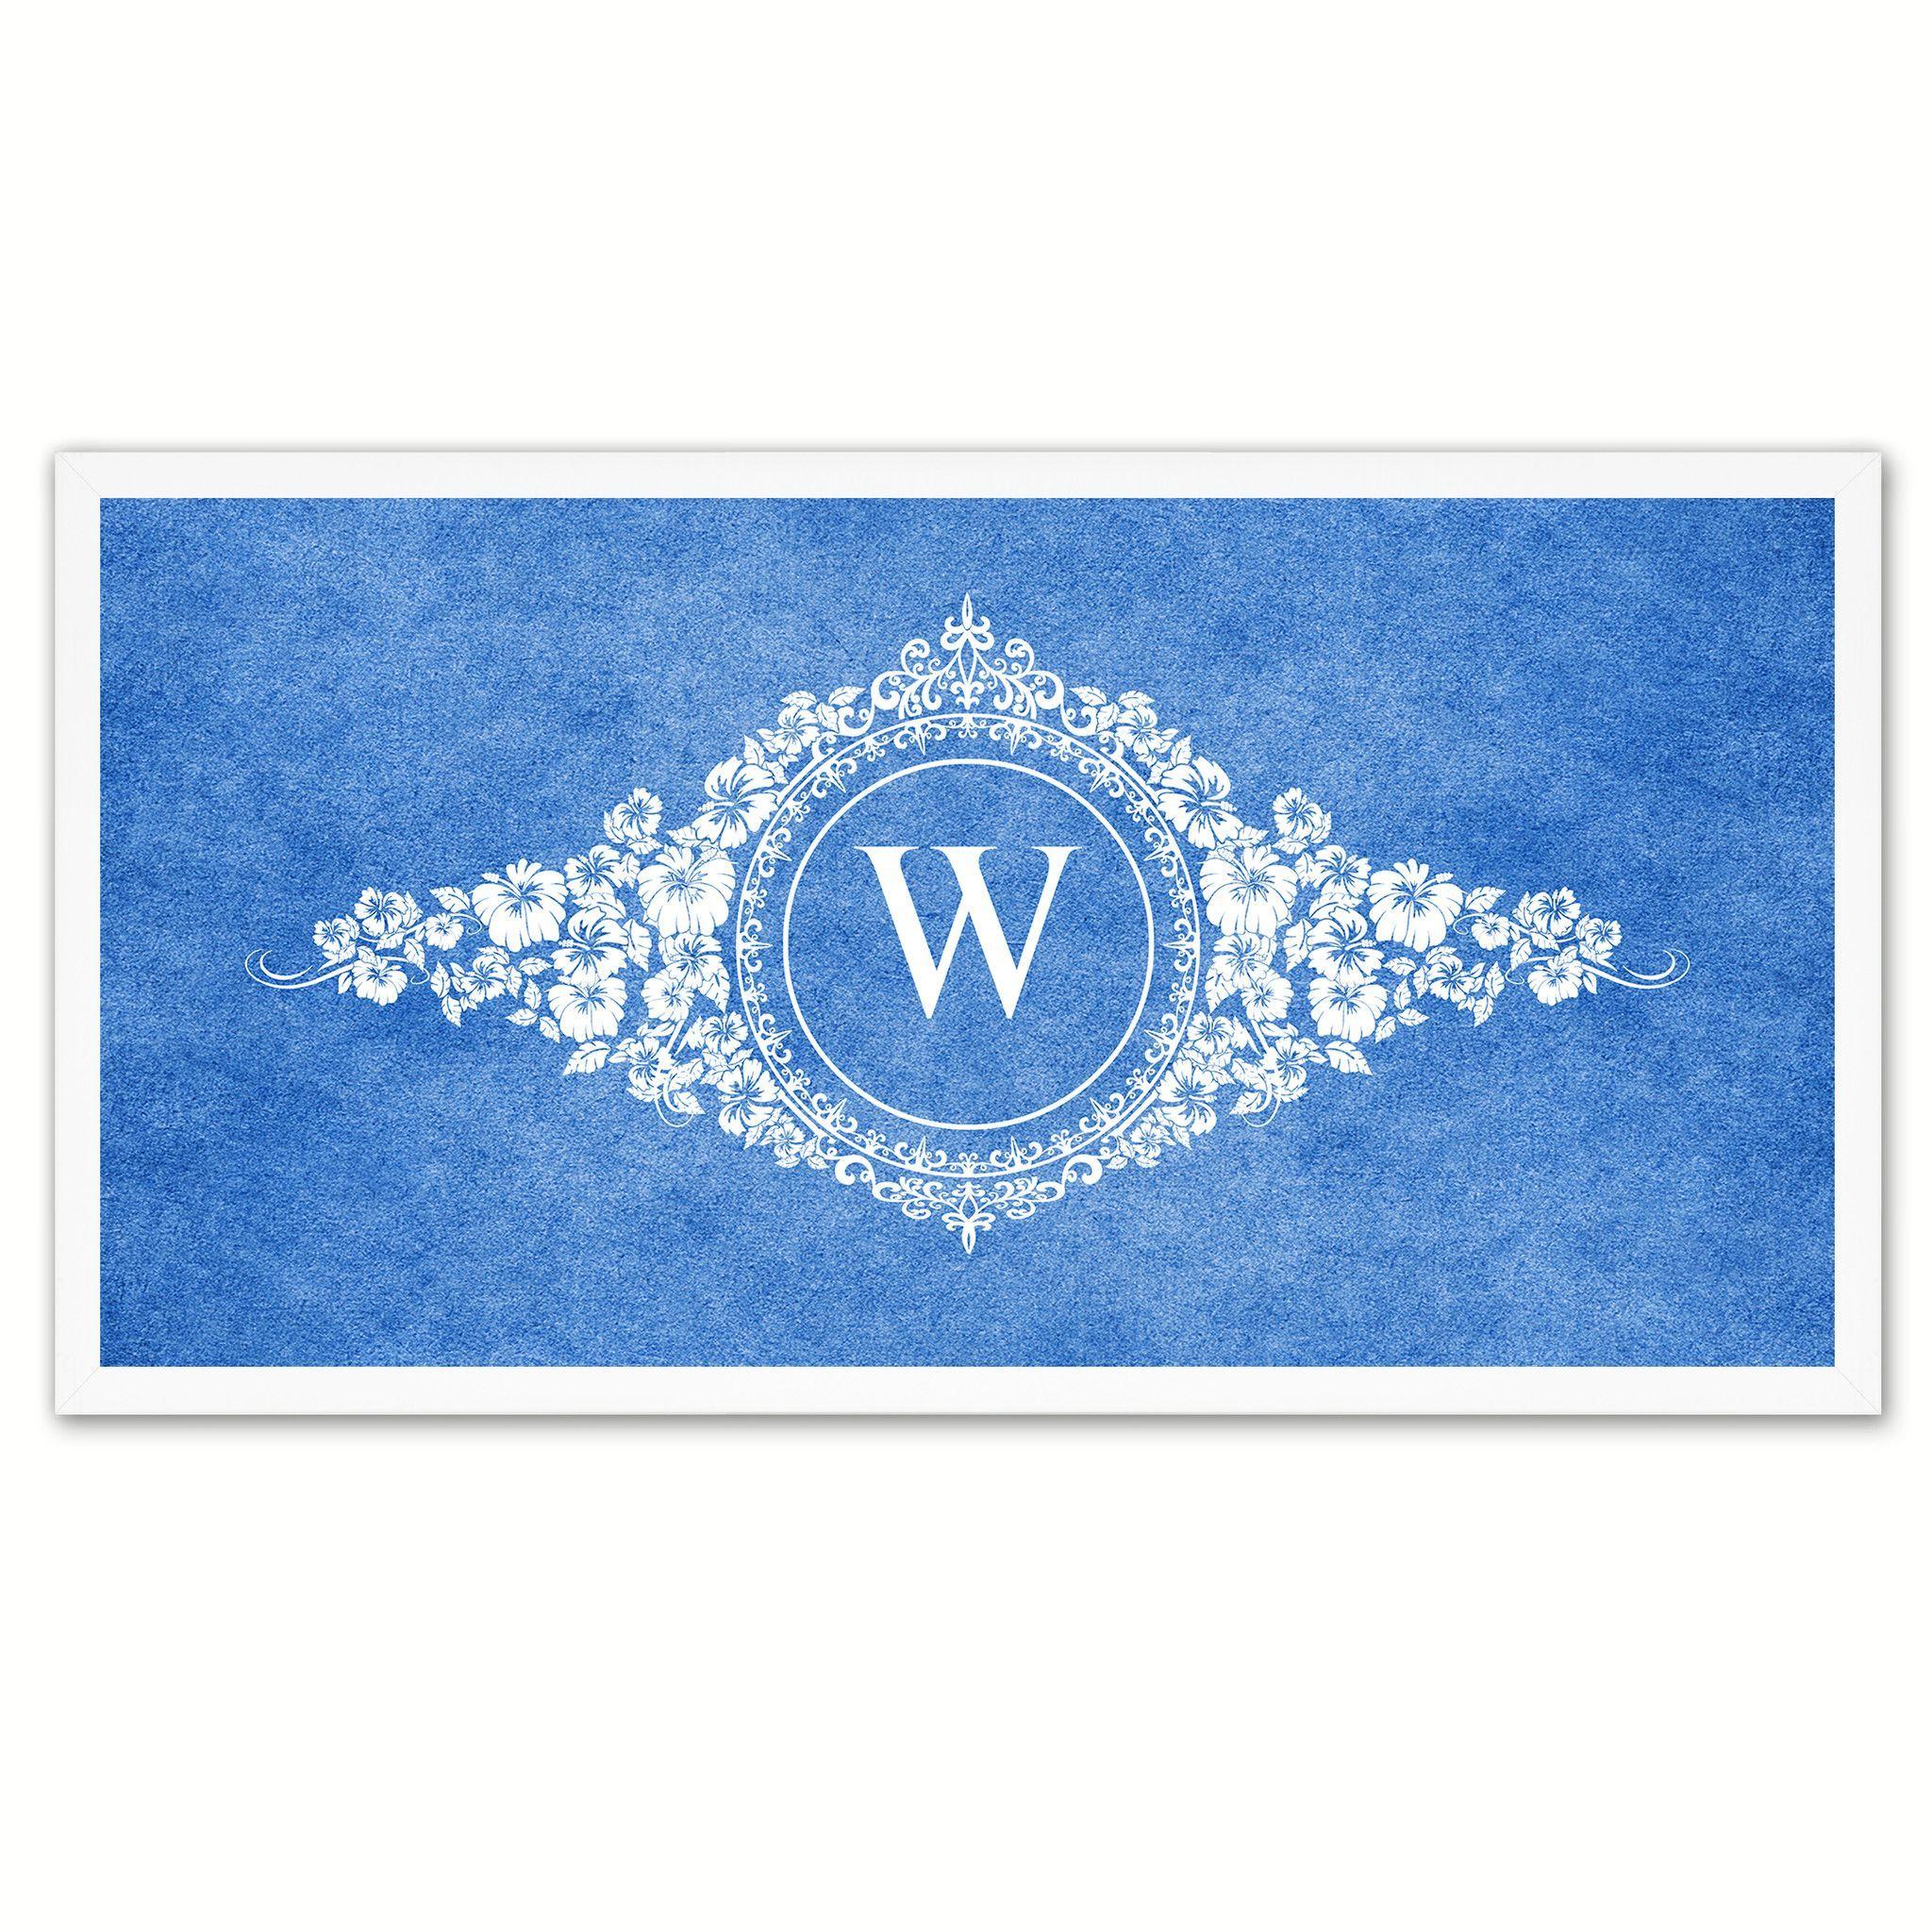 Alphabet Letter W Blue Canvas Print White Frame Kids Bedroom